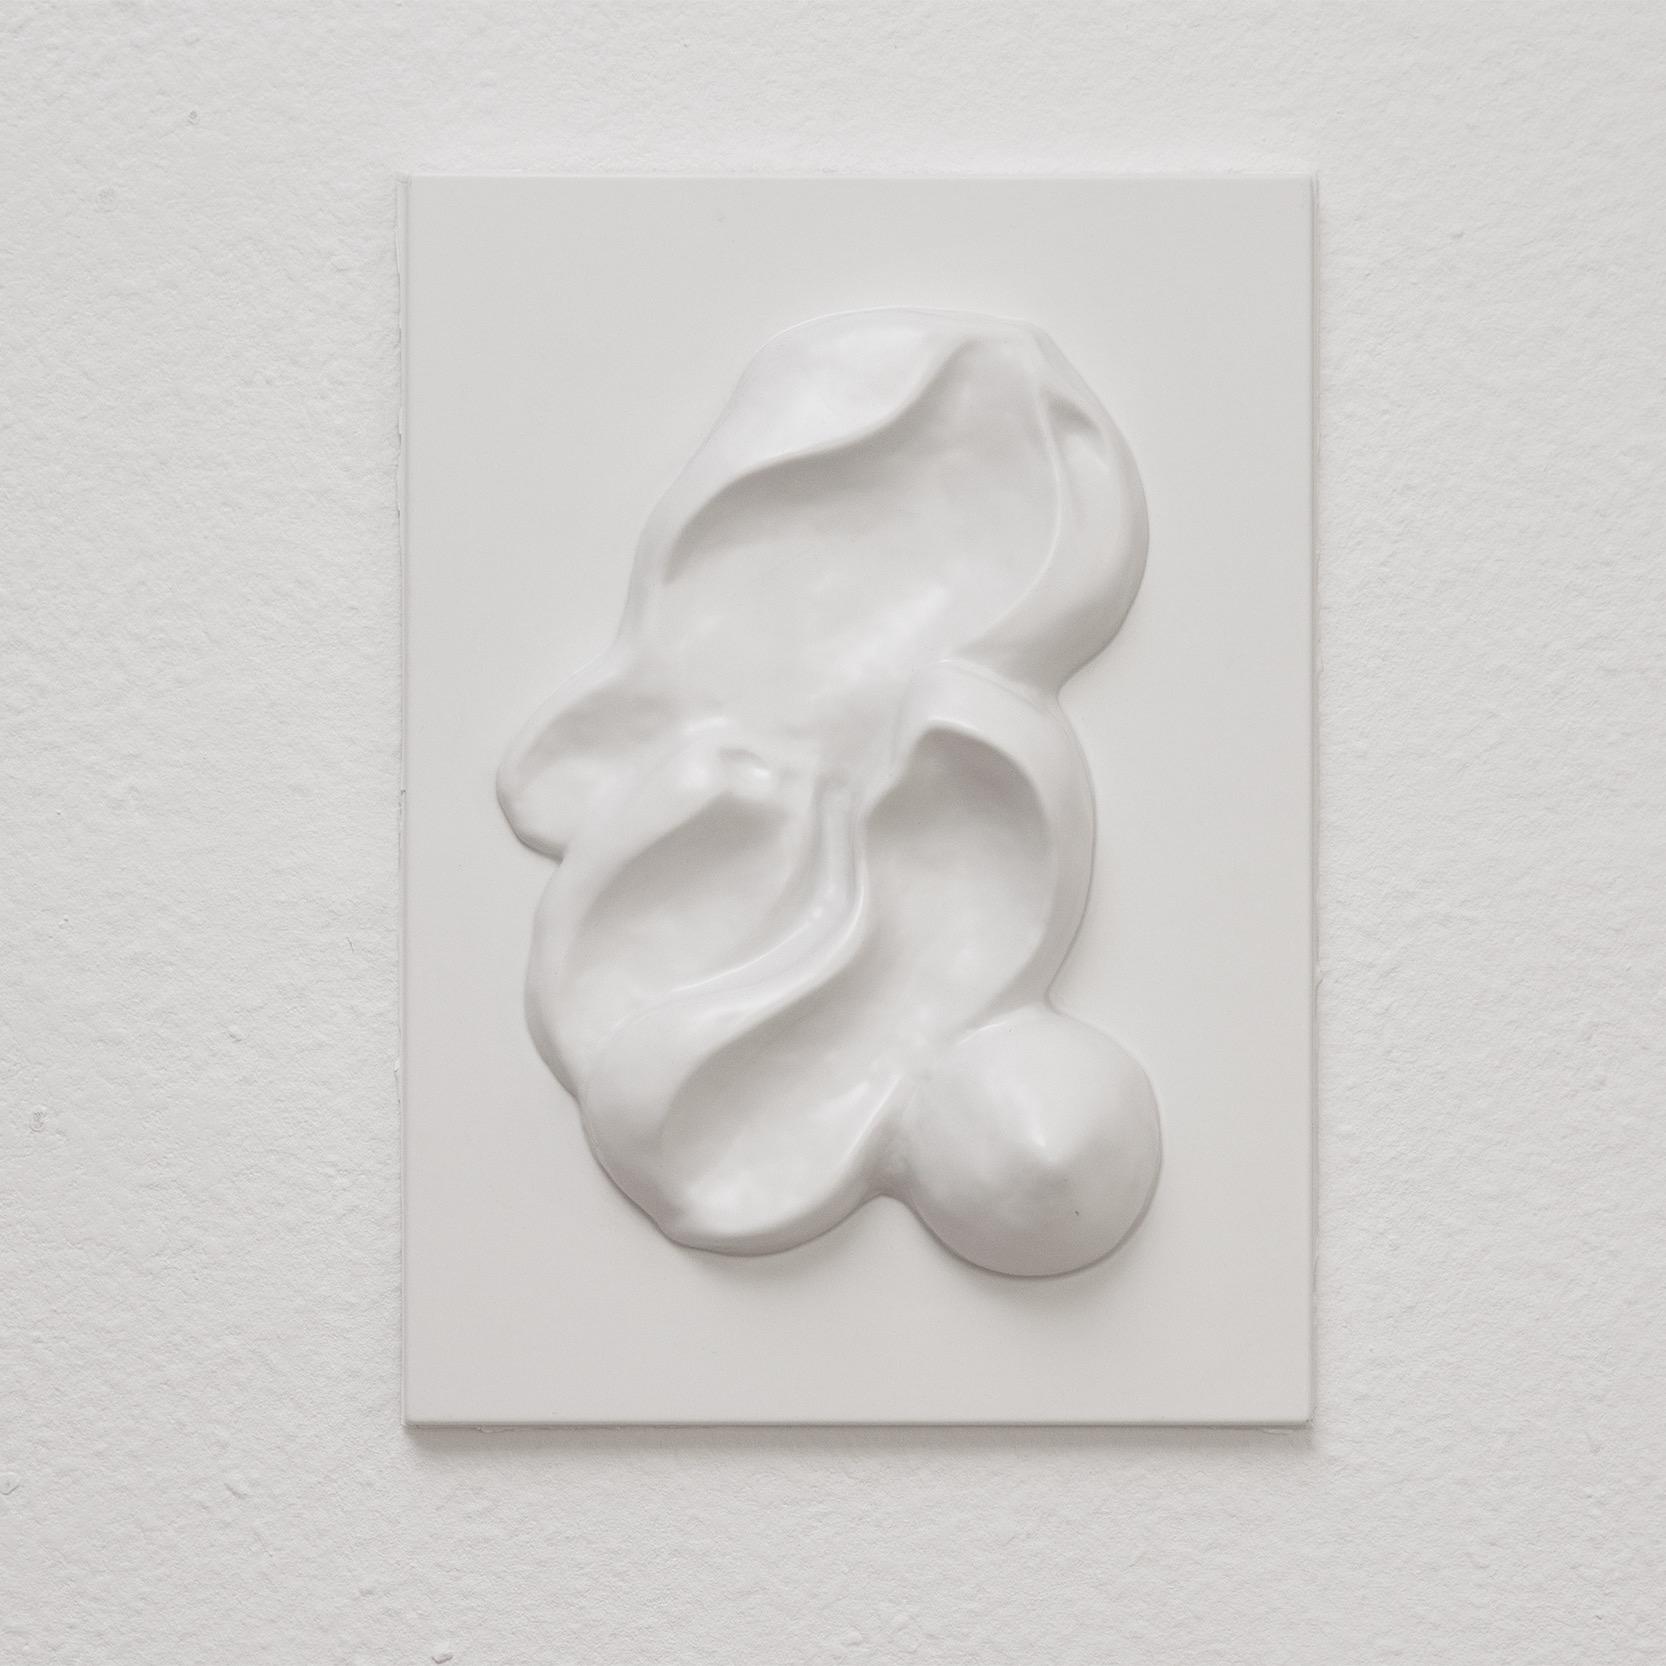 untitled,2019